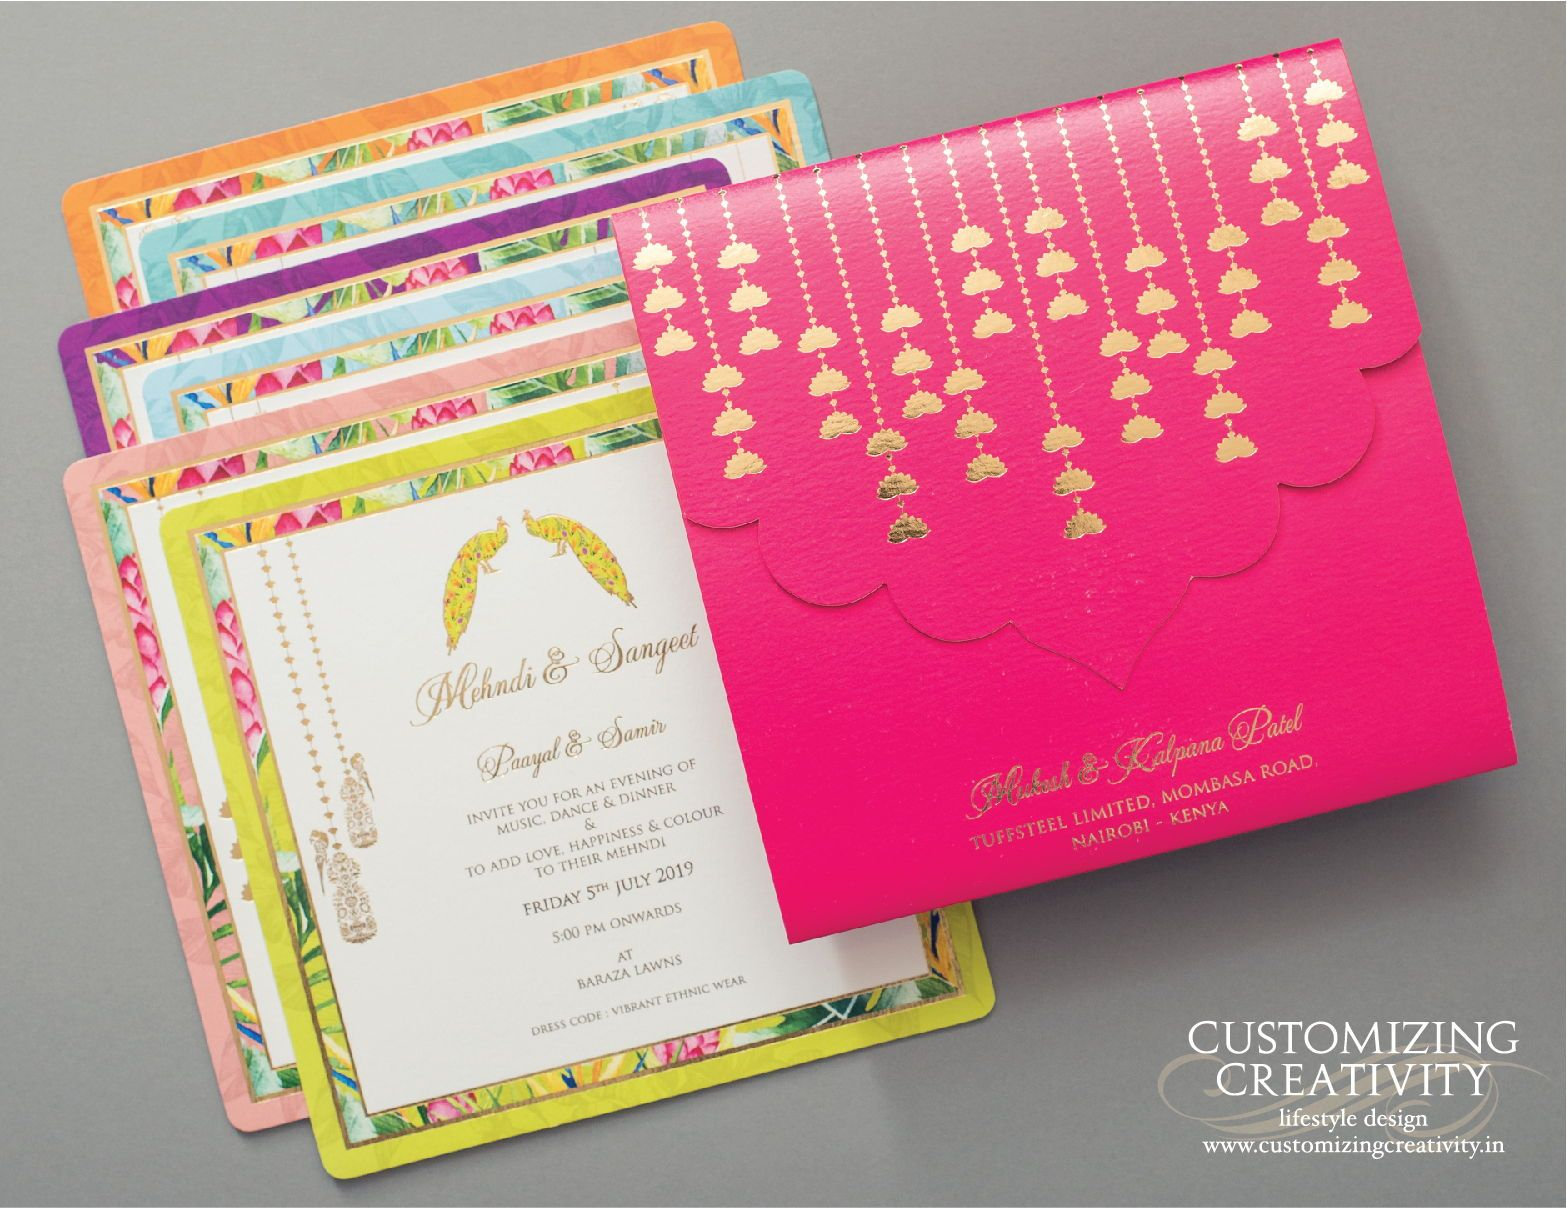 Wedding Invitation Cards Indian Wedding Cards Invites Wedding Stationery E Invite E Inv Simple Wedding Cards Wedding Invitation Cards Indian Wedding Cards